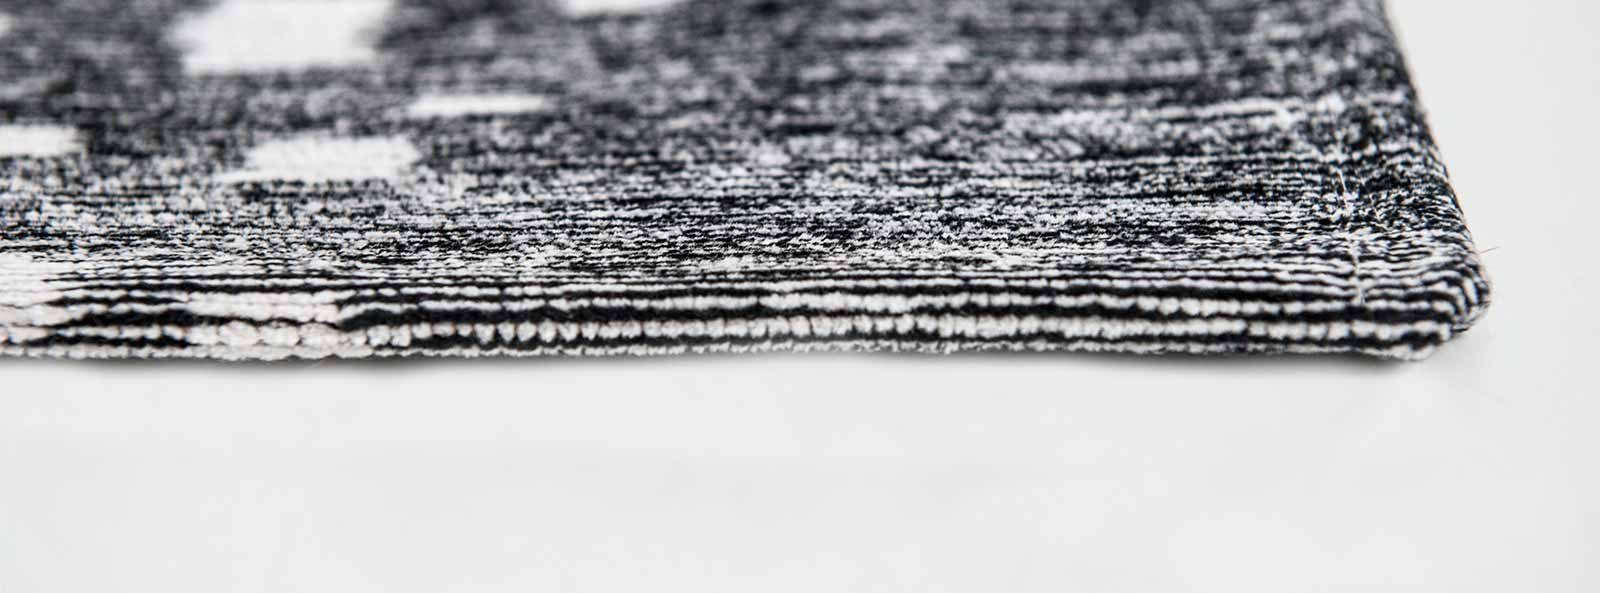 Louis De Poortere alfombras Villa Nova LX 8779 Freyr Carbon side